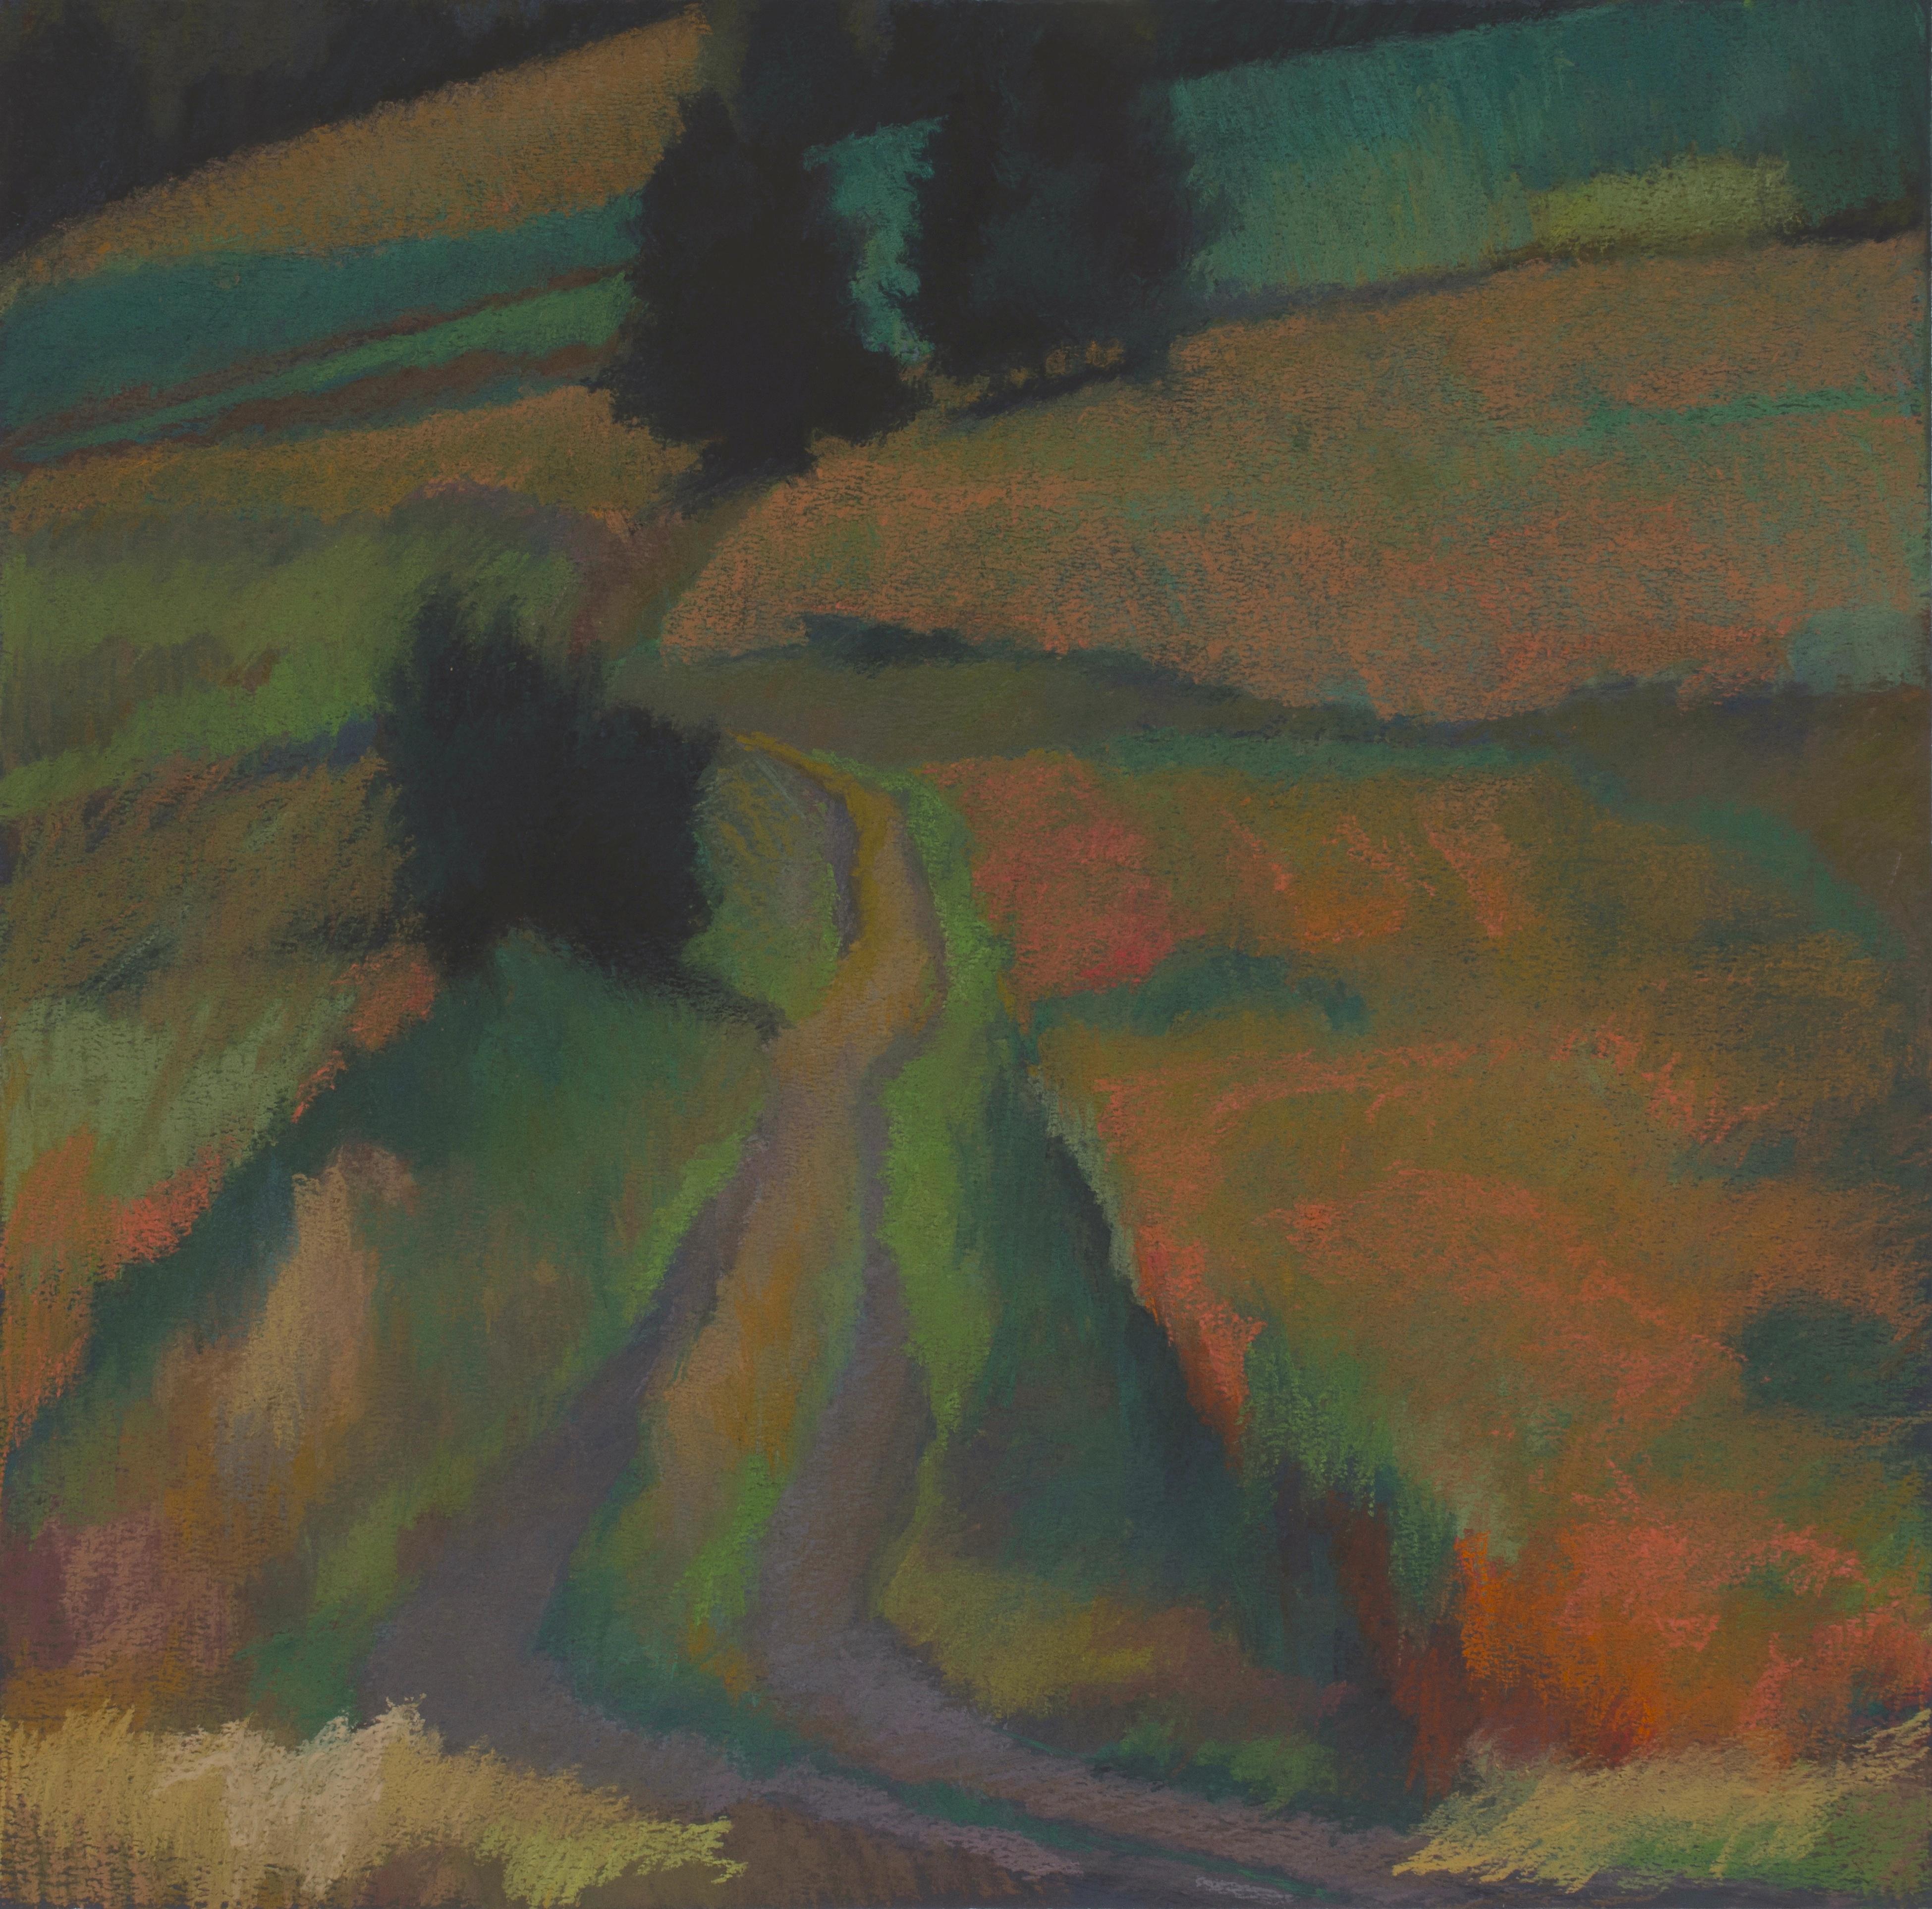 Buckwheat No. 4- Three Darks, upright